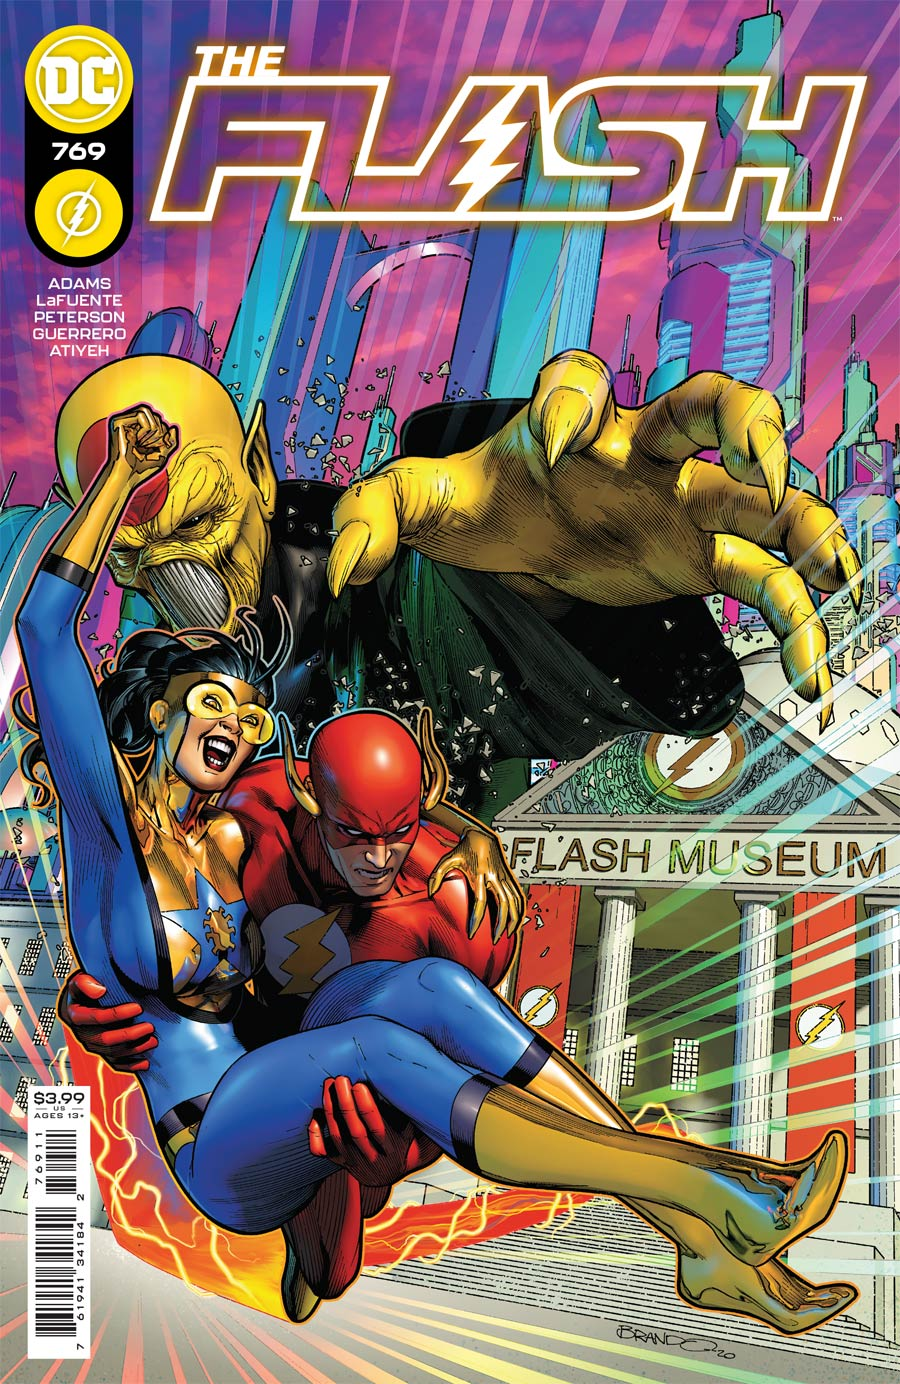 Flash Vol 5 #769 Cover A Regular Brandon Peterson Cover